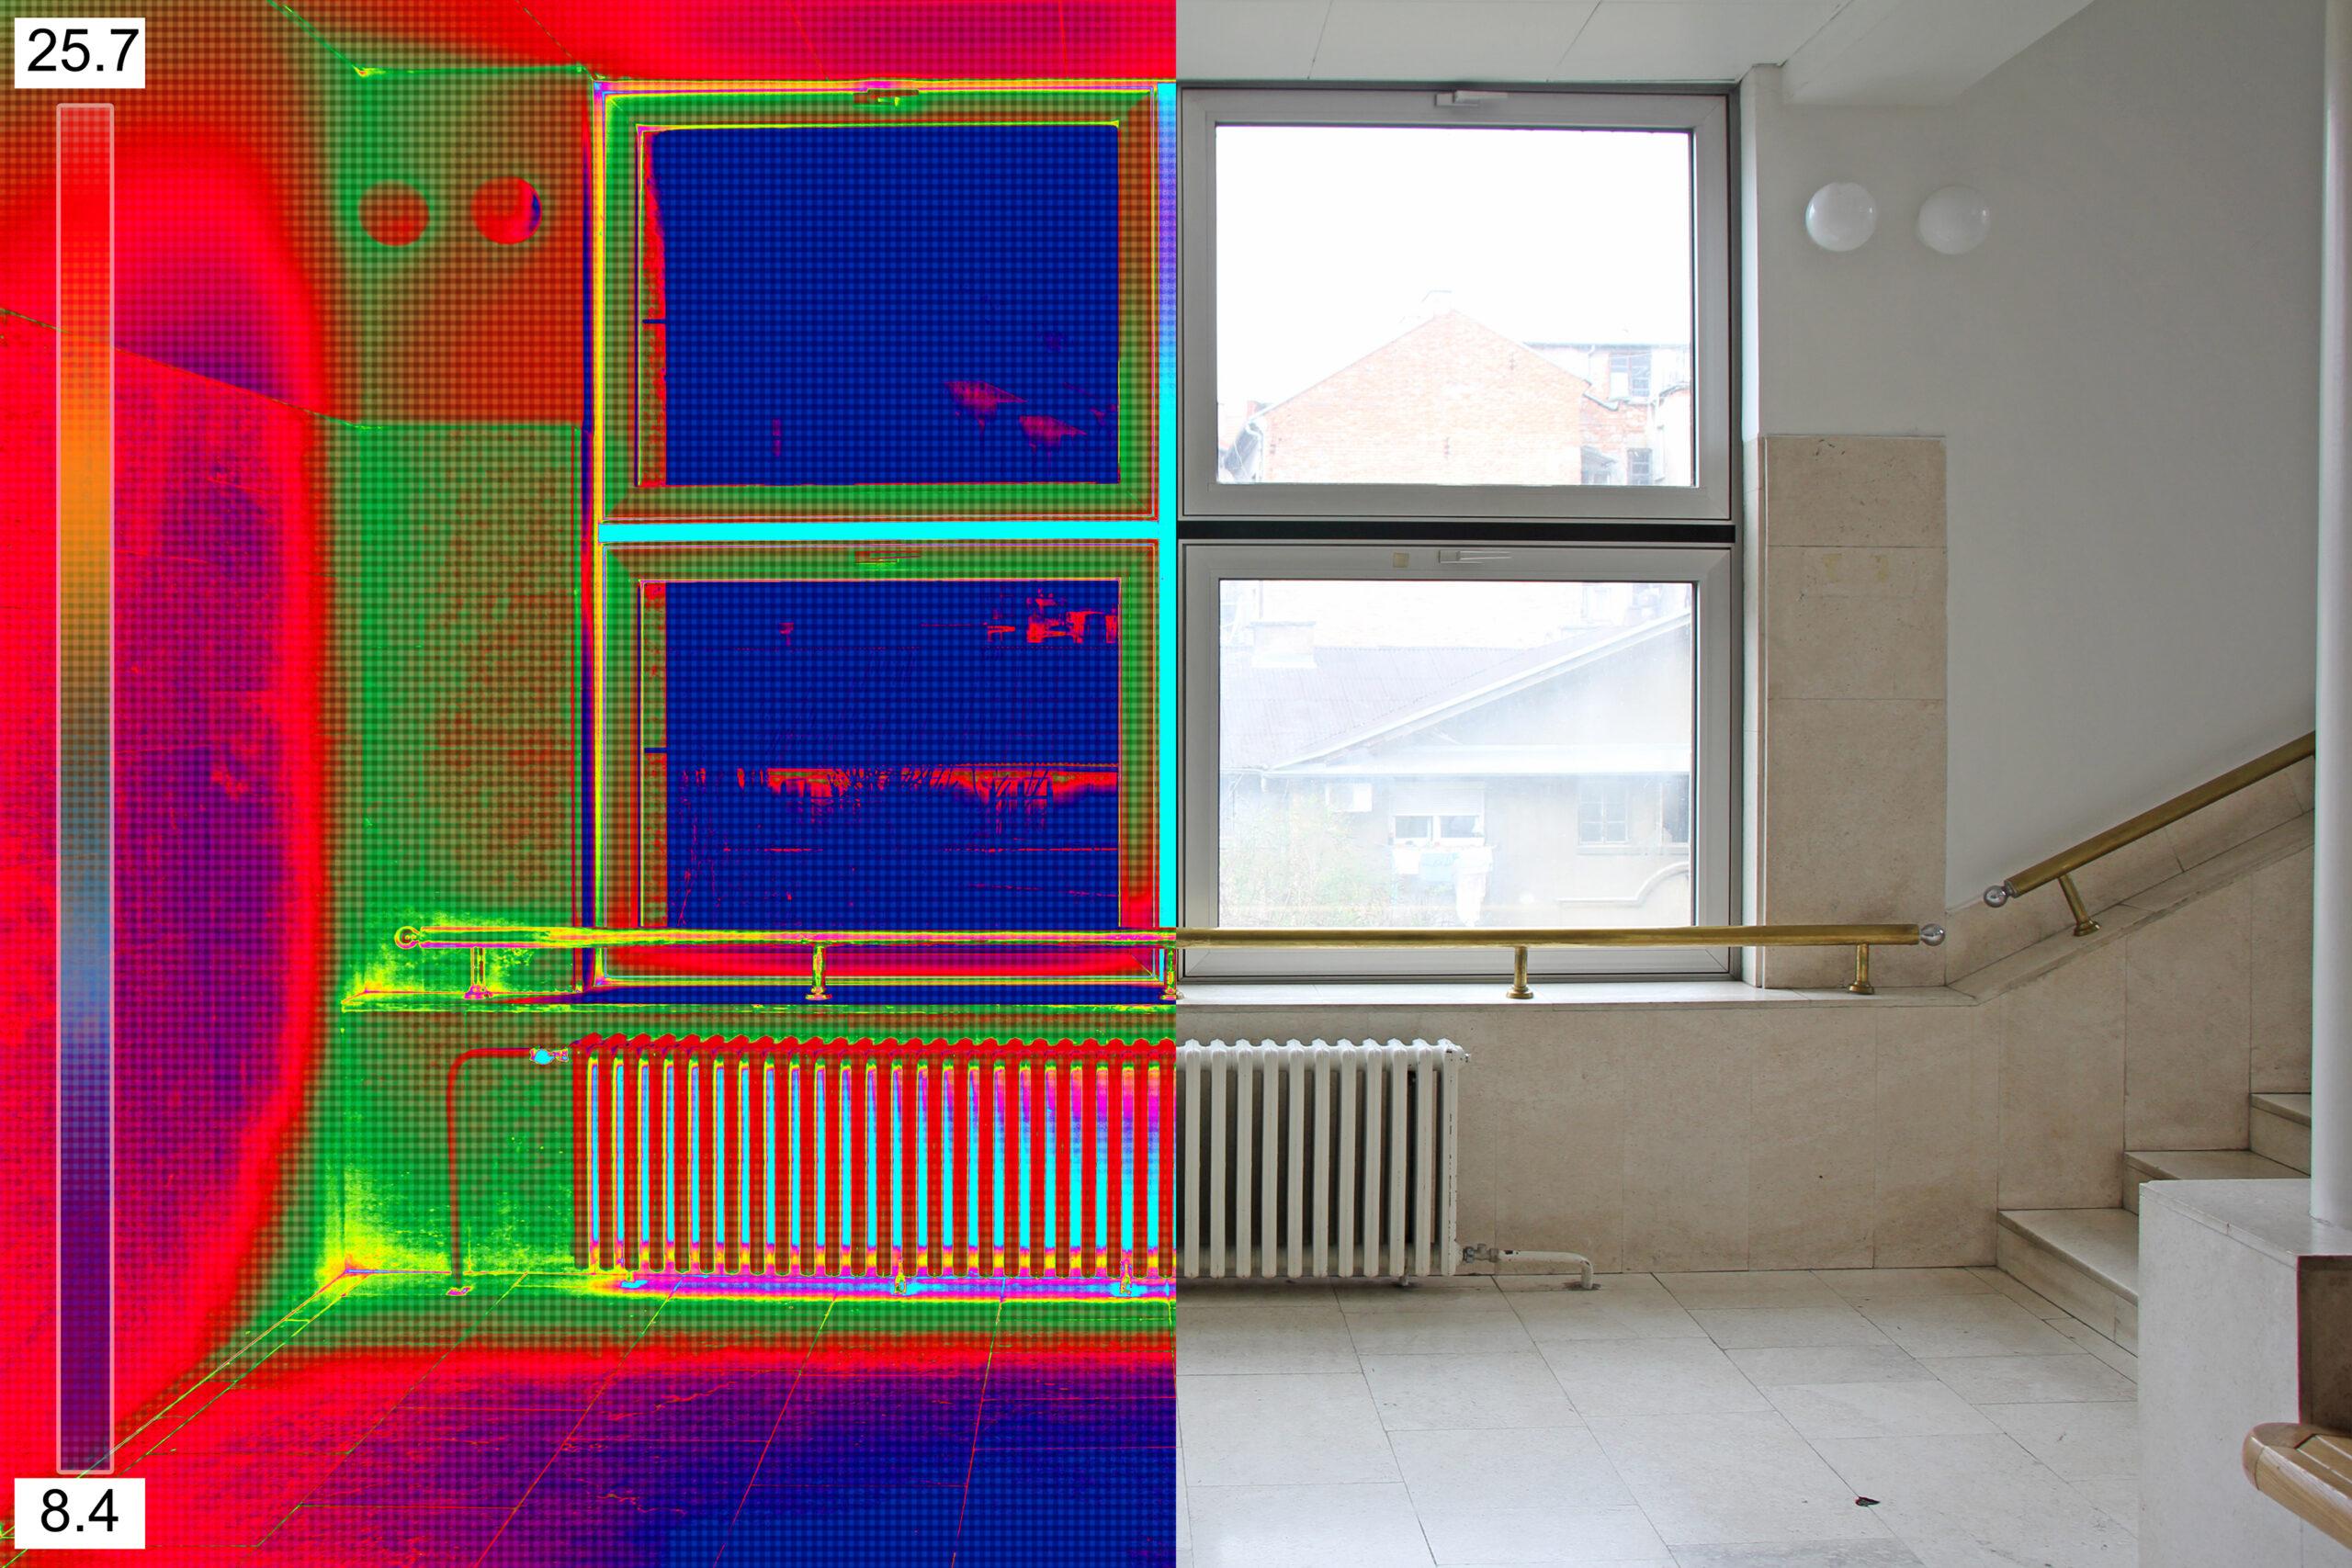 inspect_window